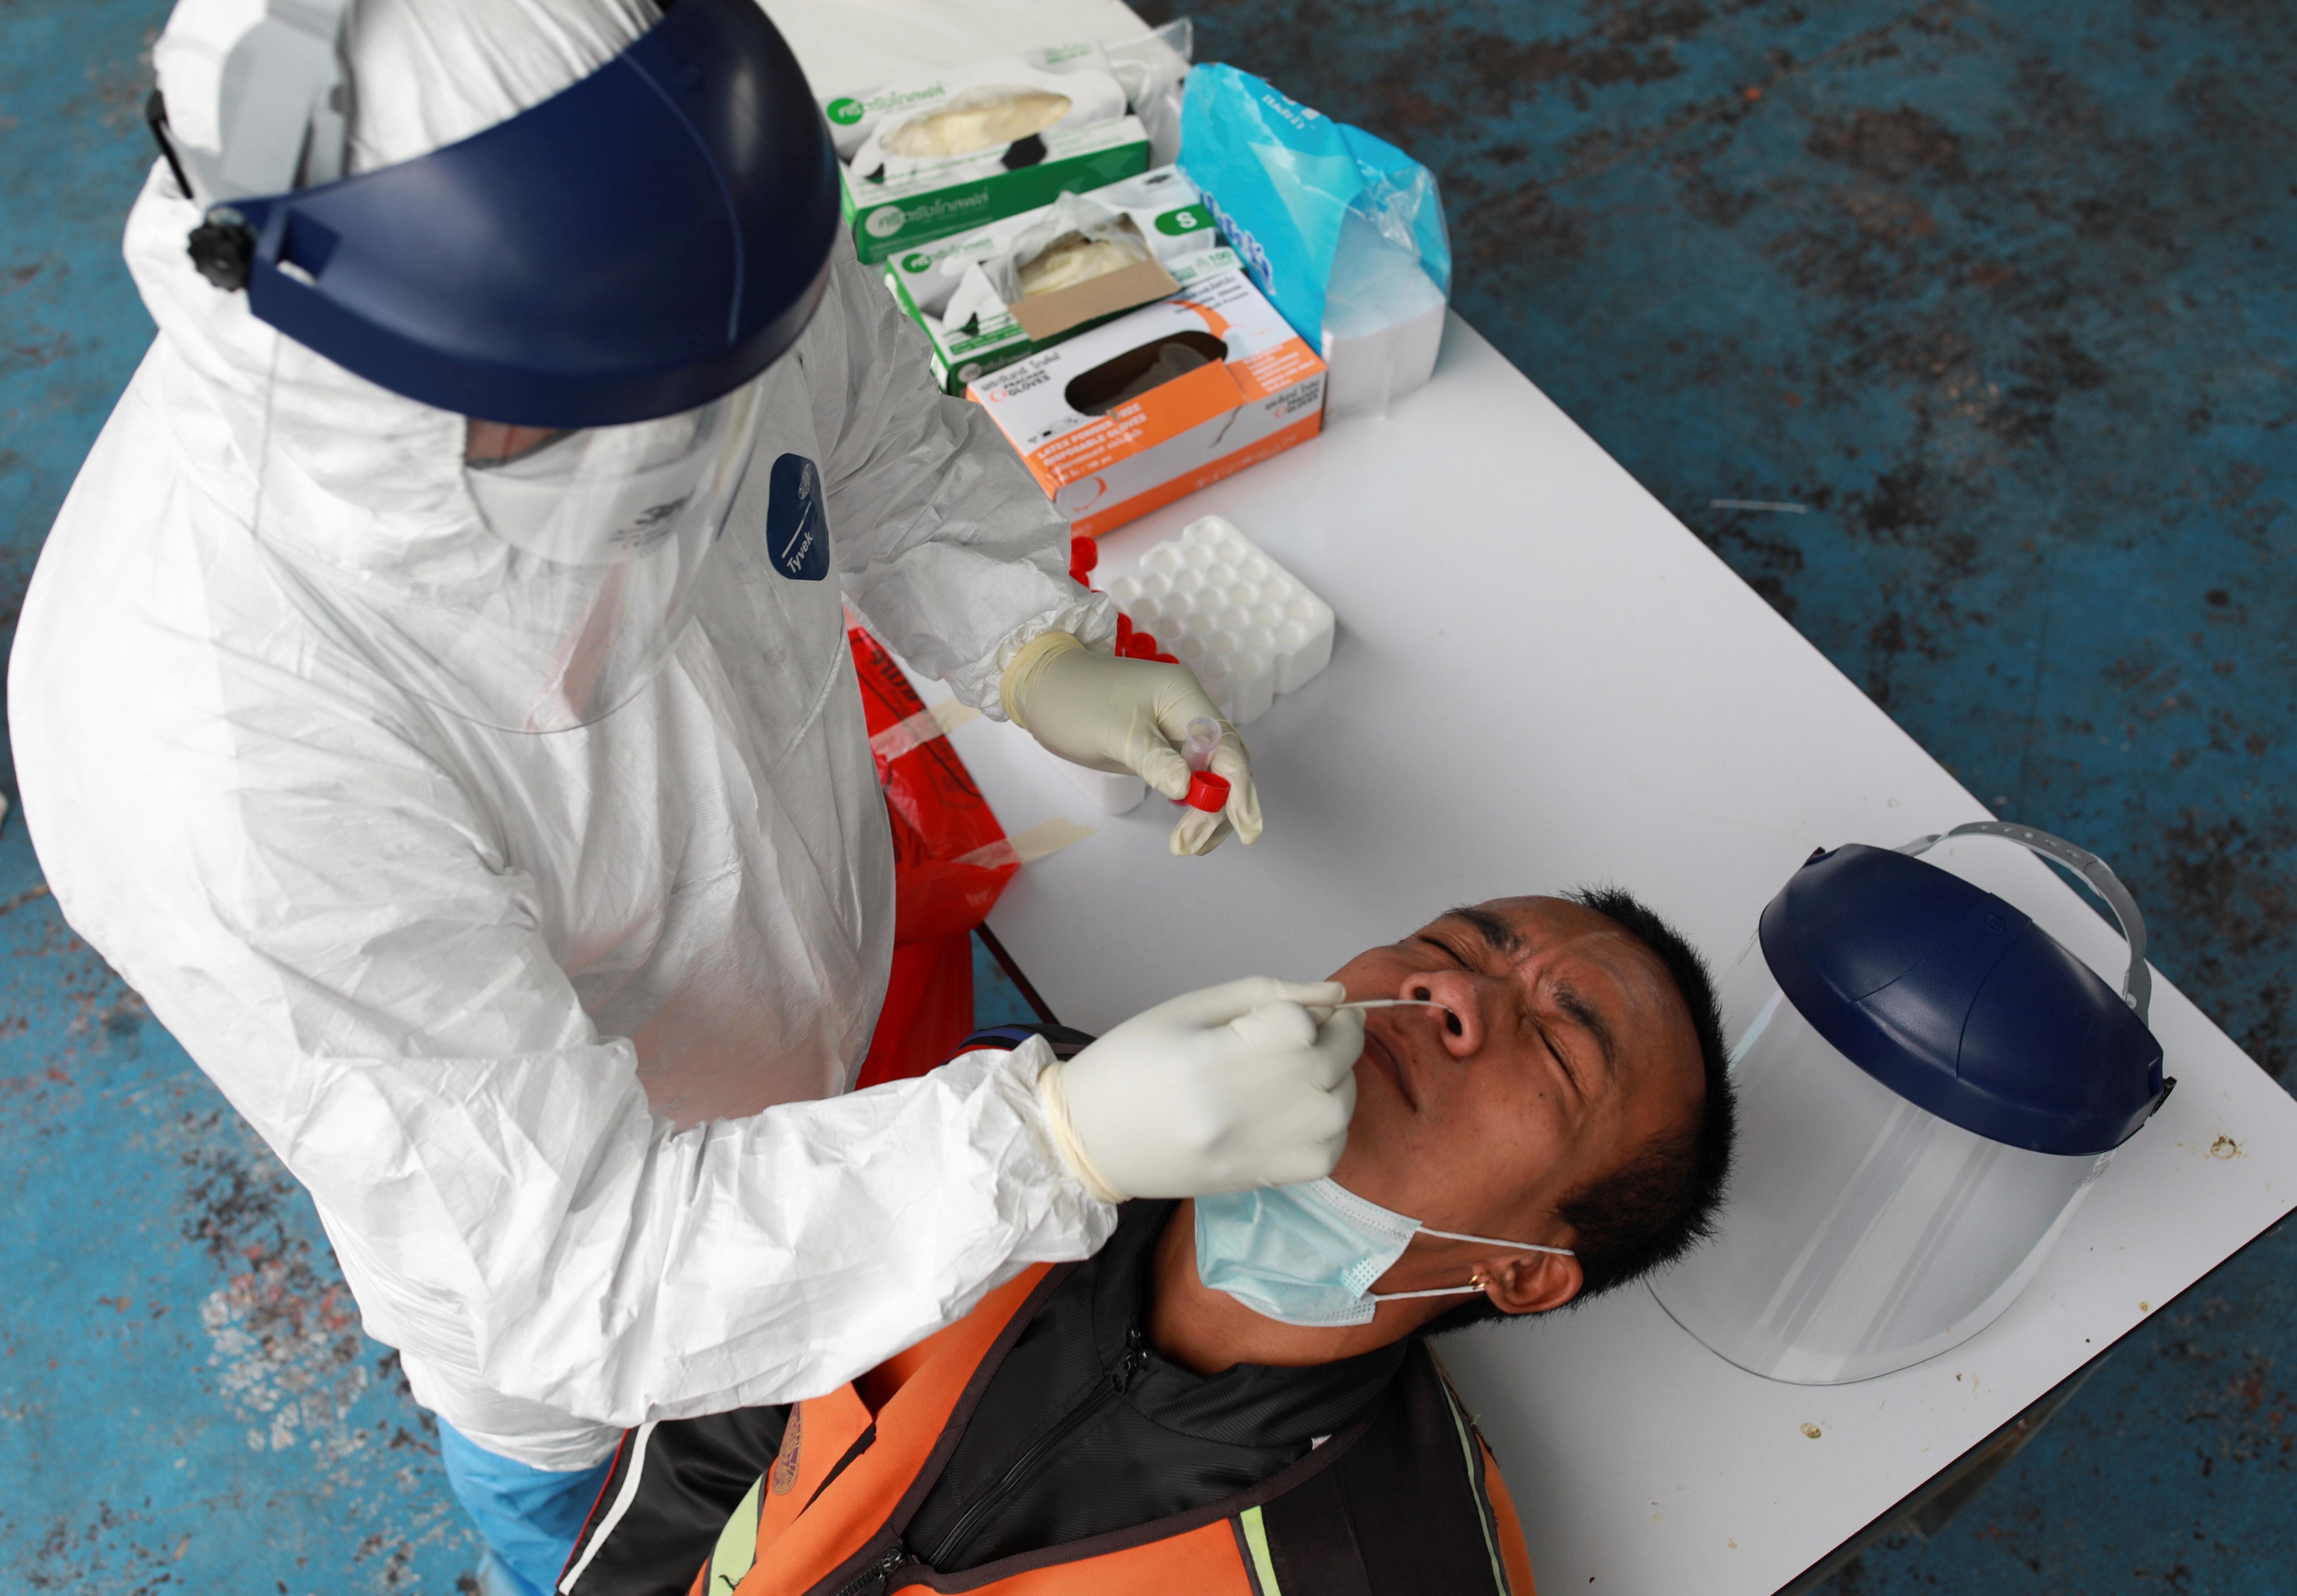 A health worker takes a nasal swab sample from a man from Klong Toey community, for a coronavirus disease (COVID-19) test, in Bangkok, Thailand, May 4, 2021. REUTERS/Soe Zeya Tun